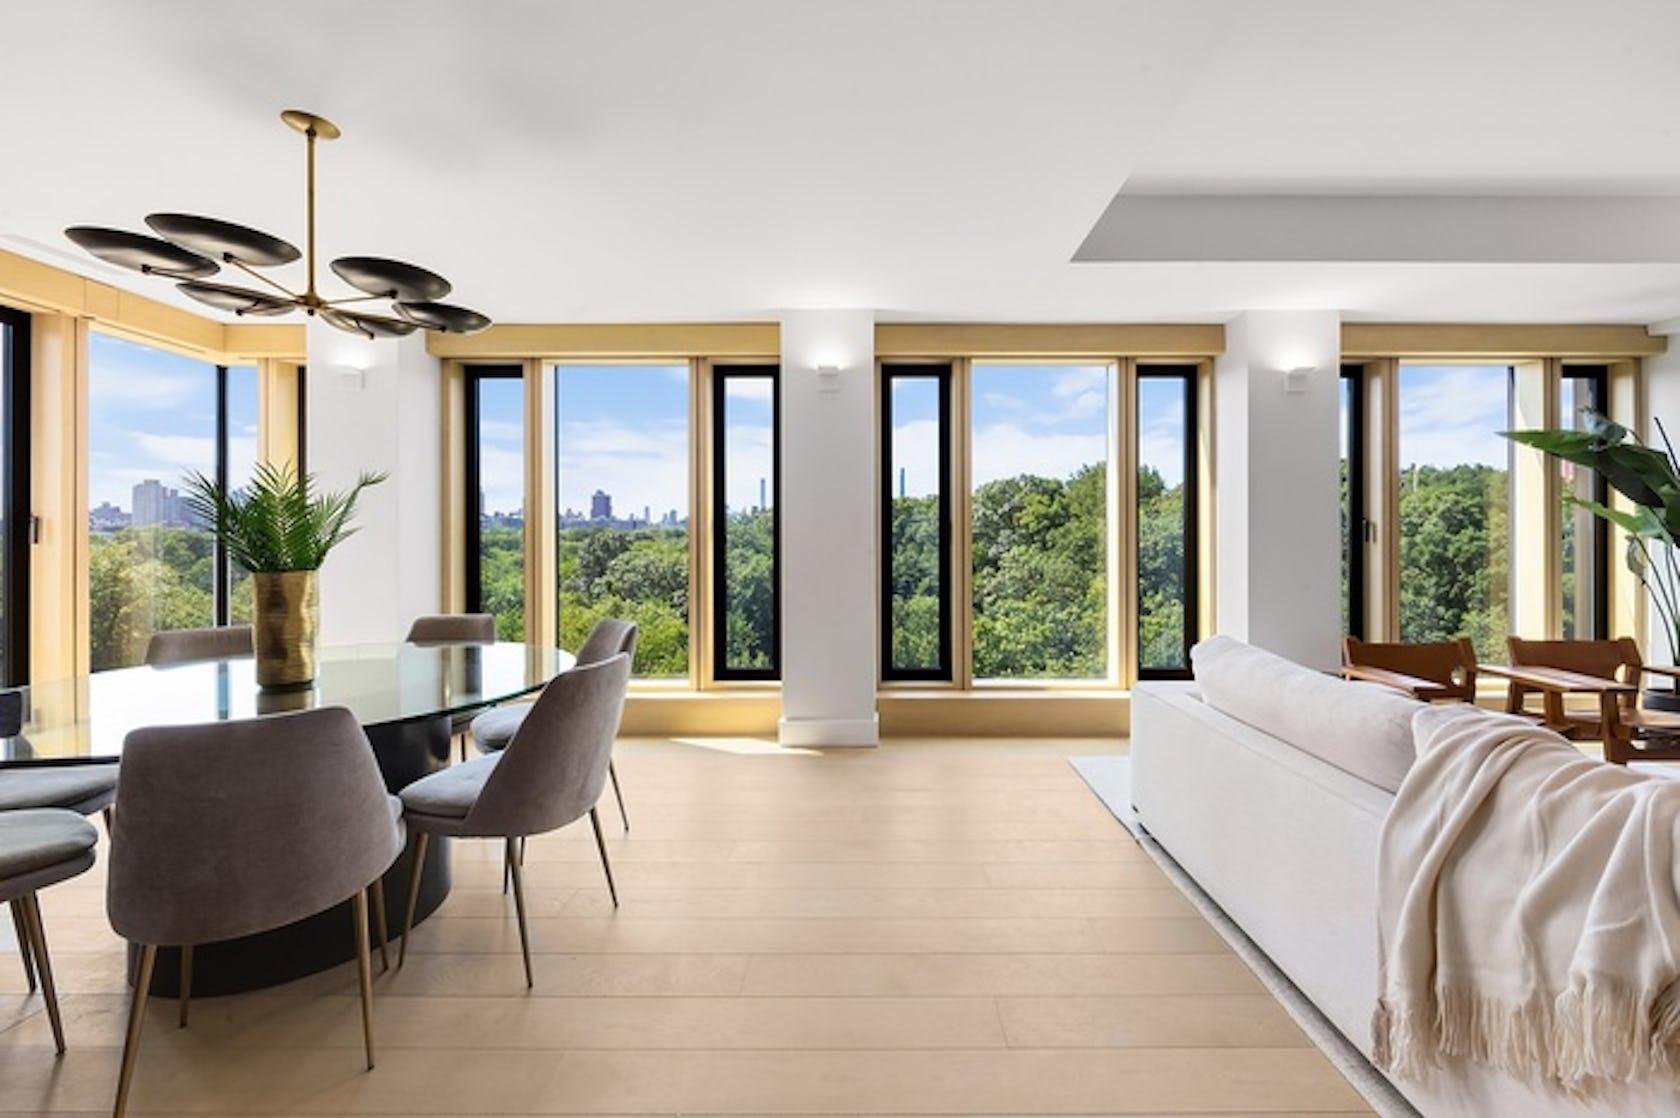 chair furniture indoors interior design room housing building